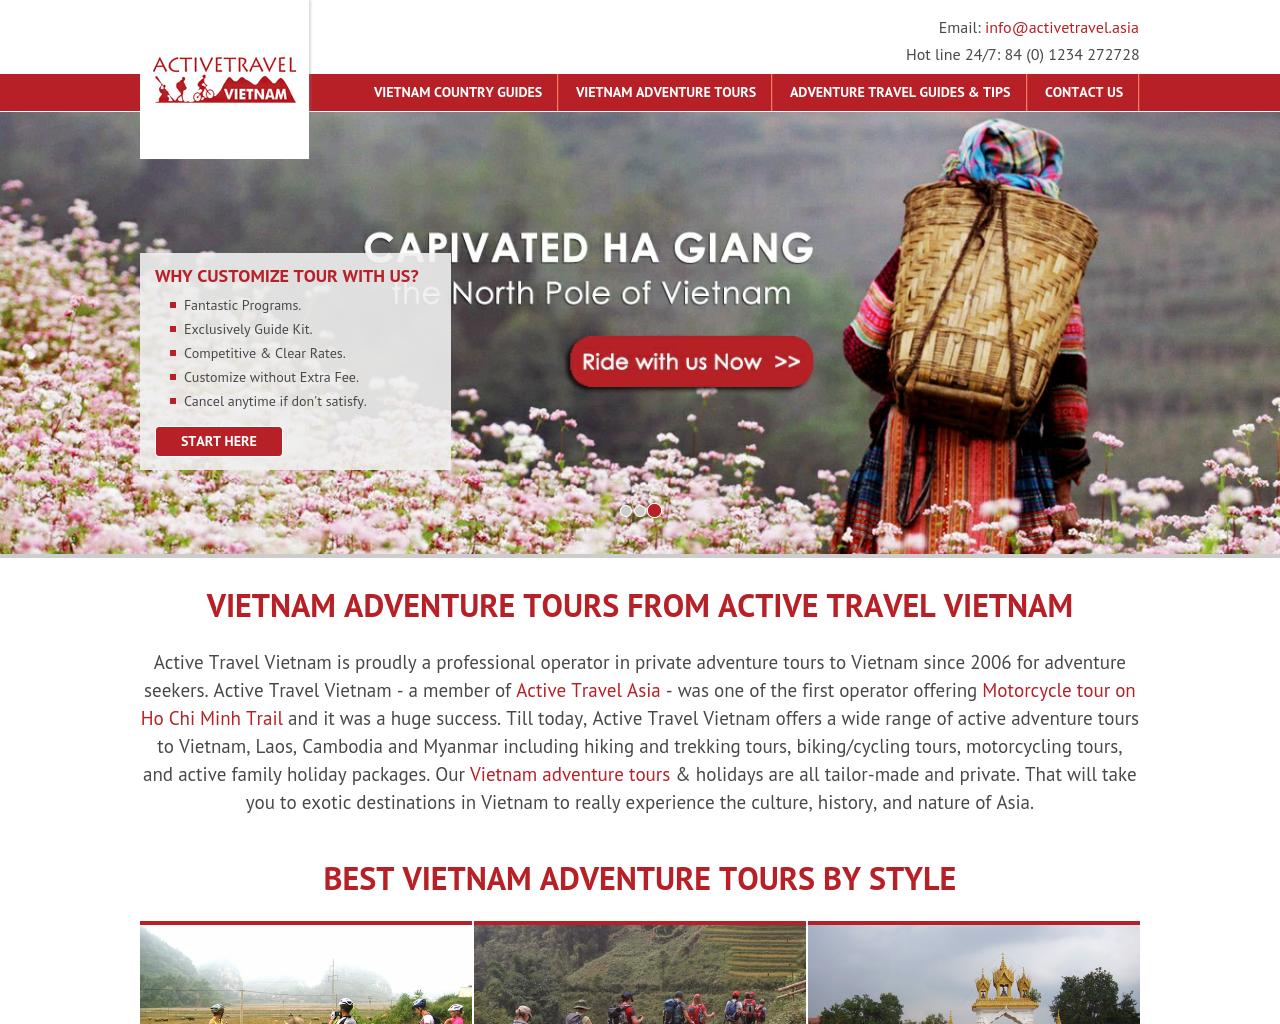 Active-Travel-Vietnam-Advertising-Reviews-Pricing